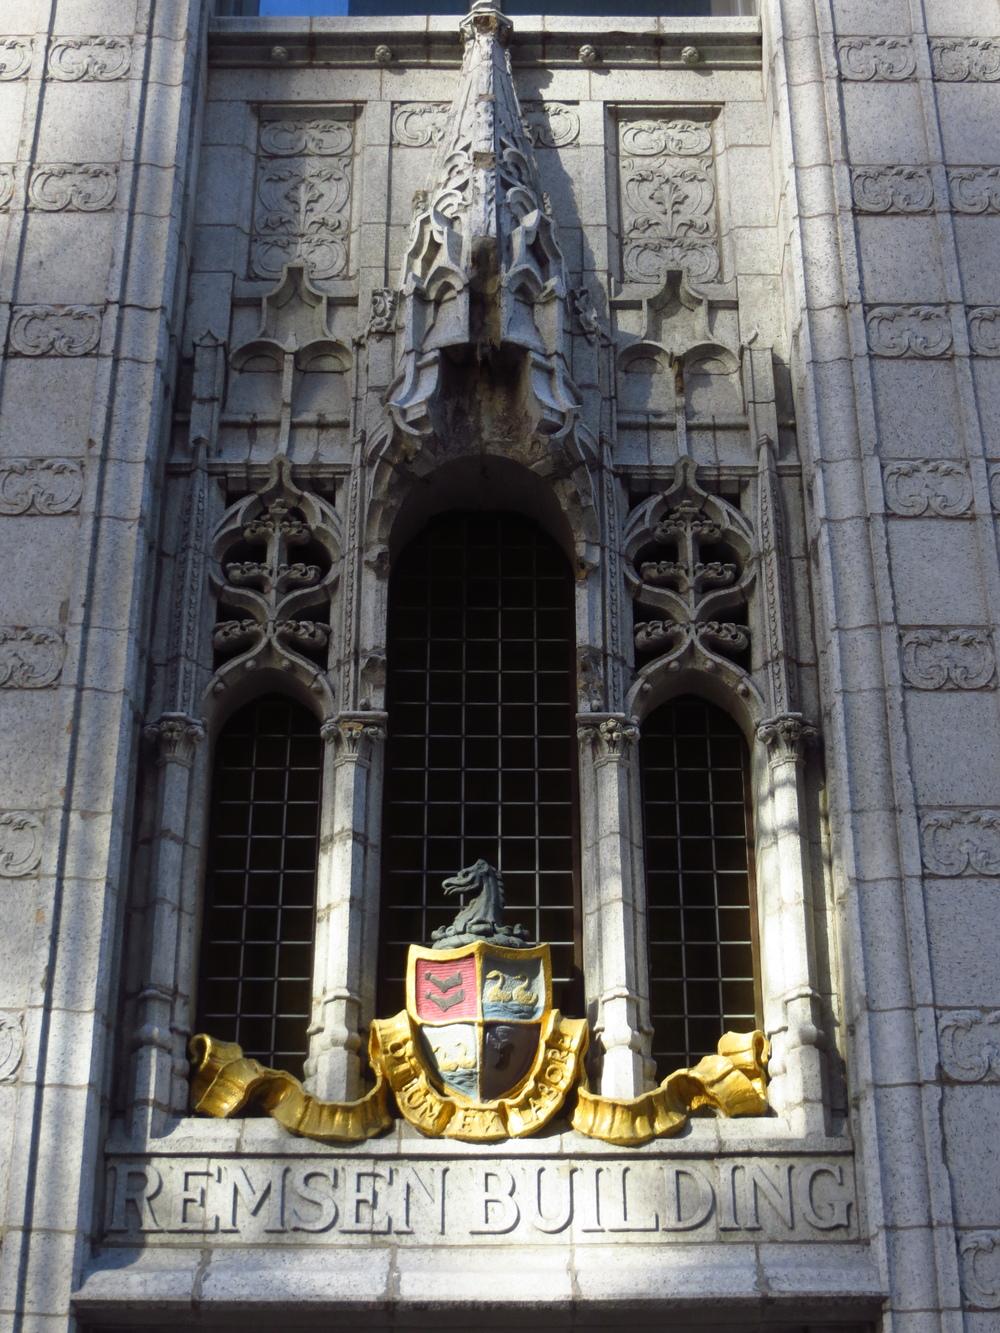 Remsen Building